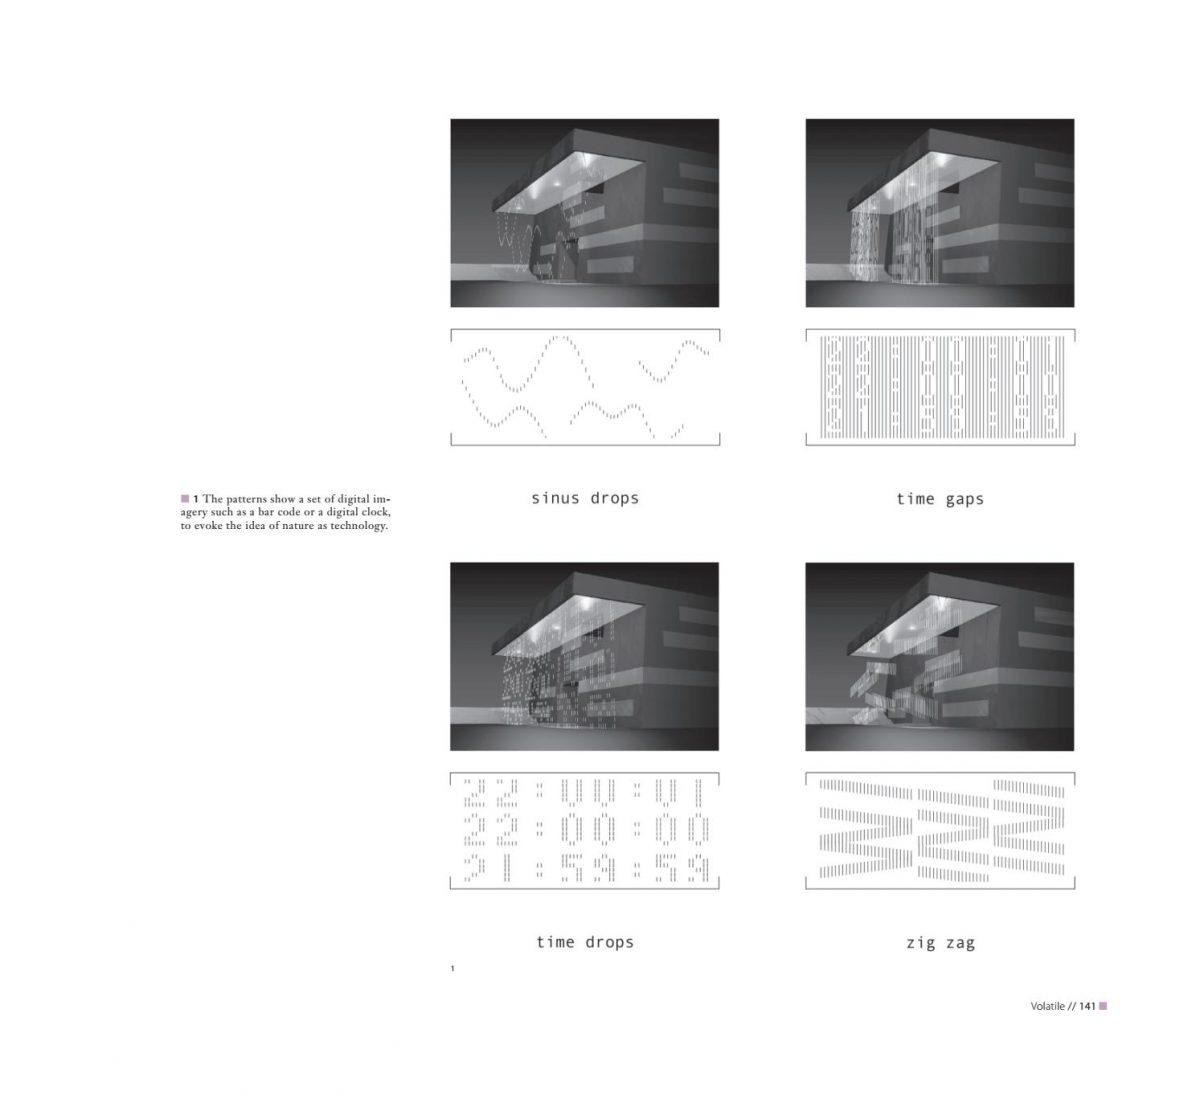 http://www.petkovstudio.com/bg/wp-content/uploads/2017/03/page_141-1200x1095.jpg